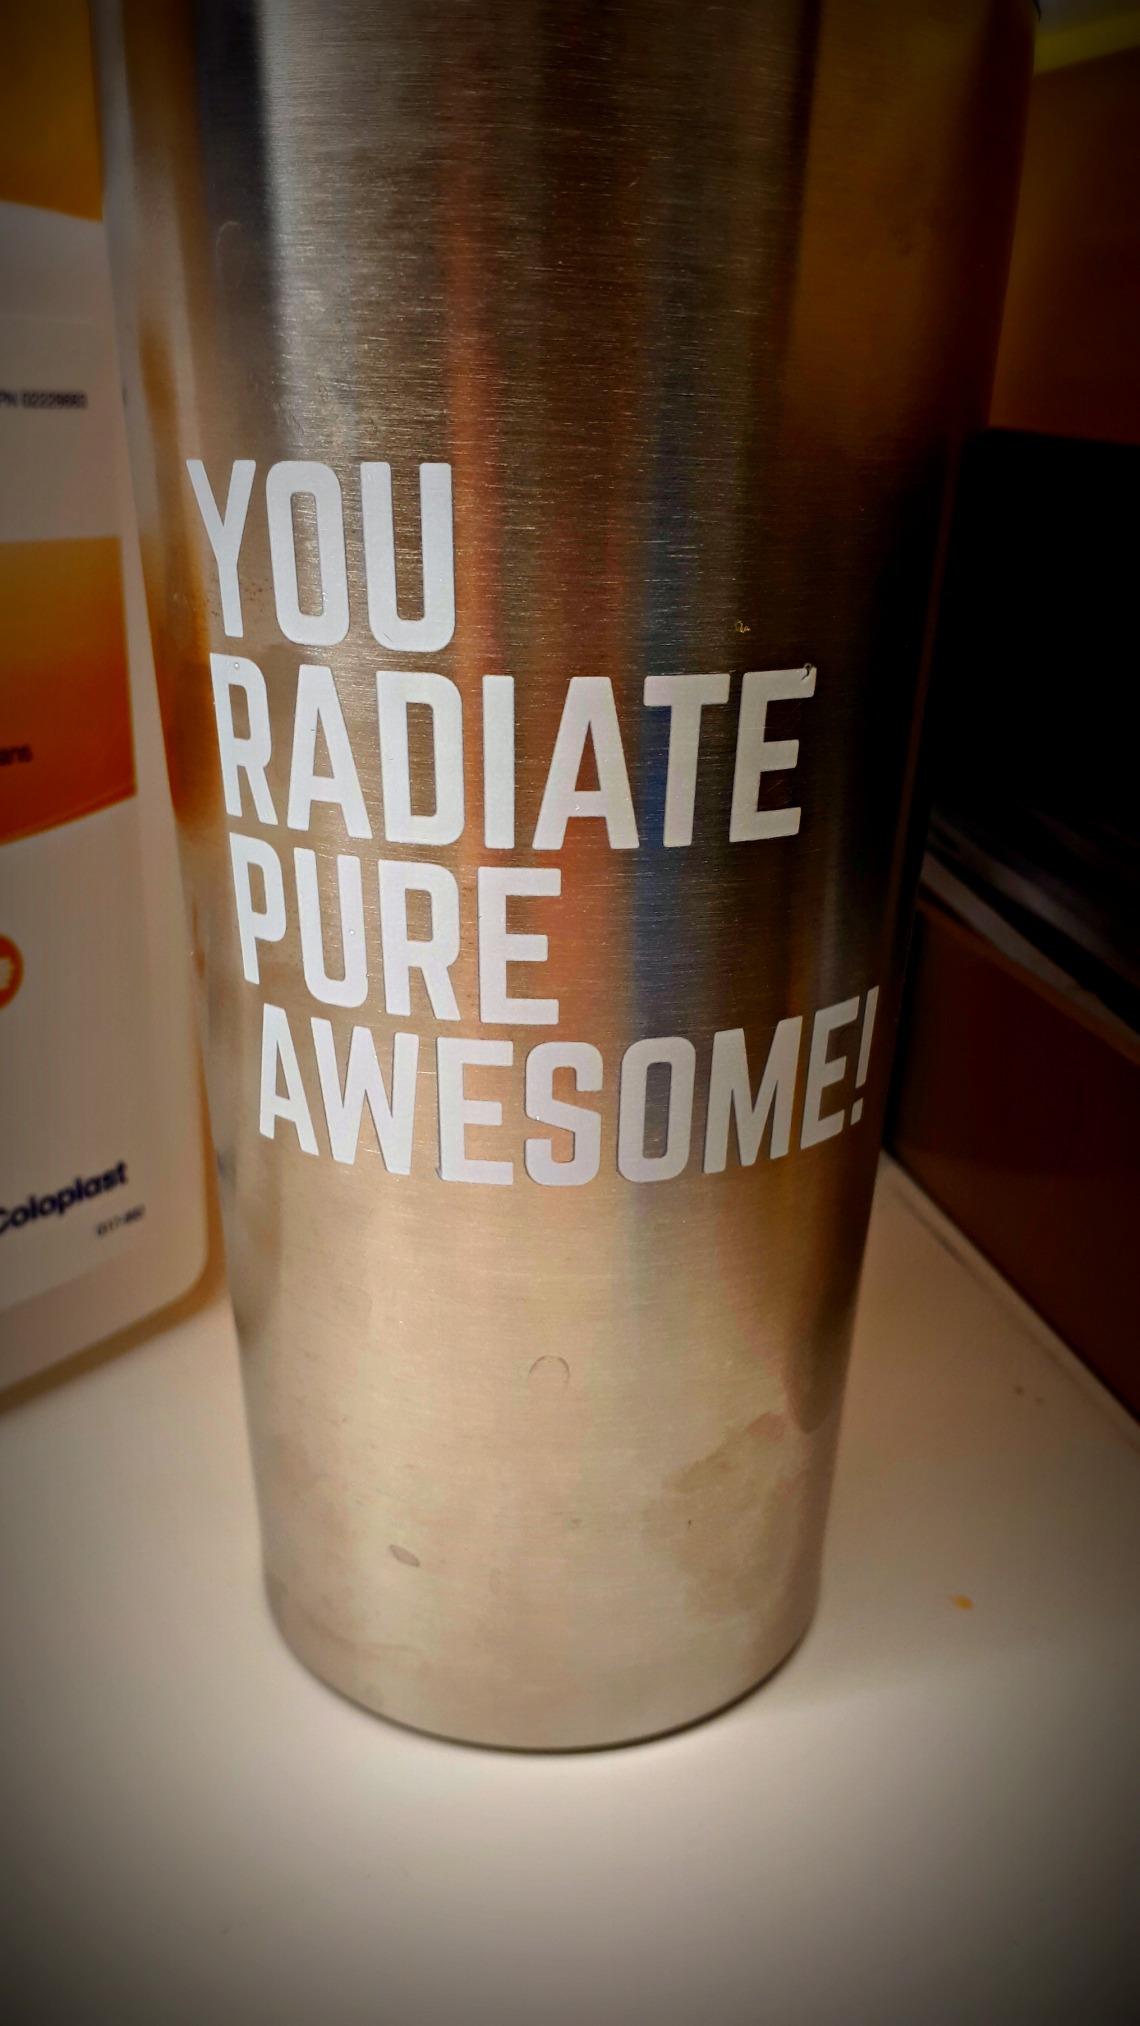 339 you radiate.jpg